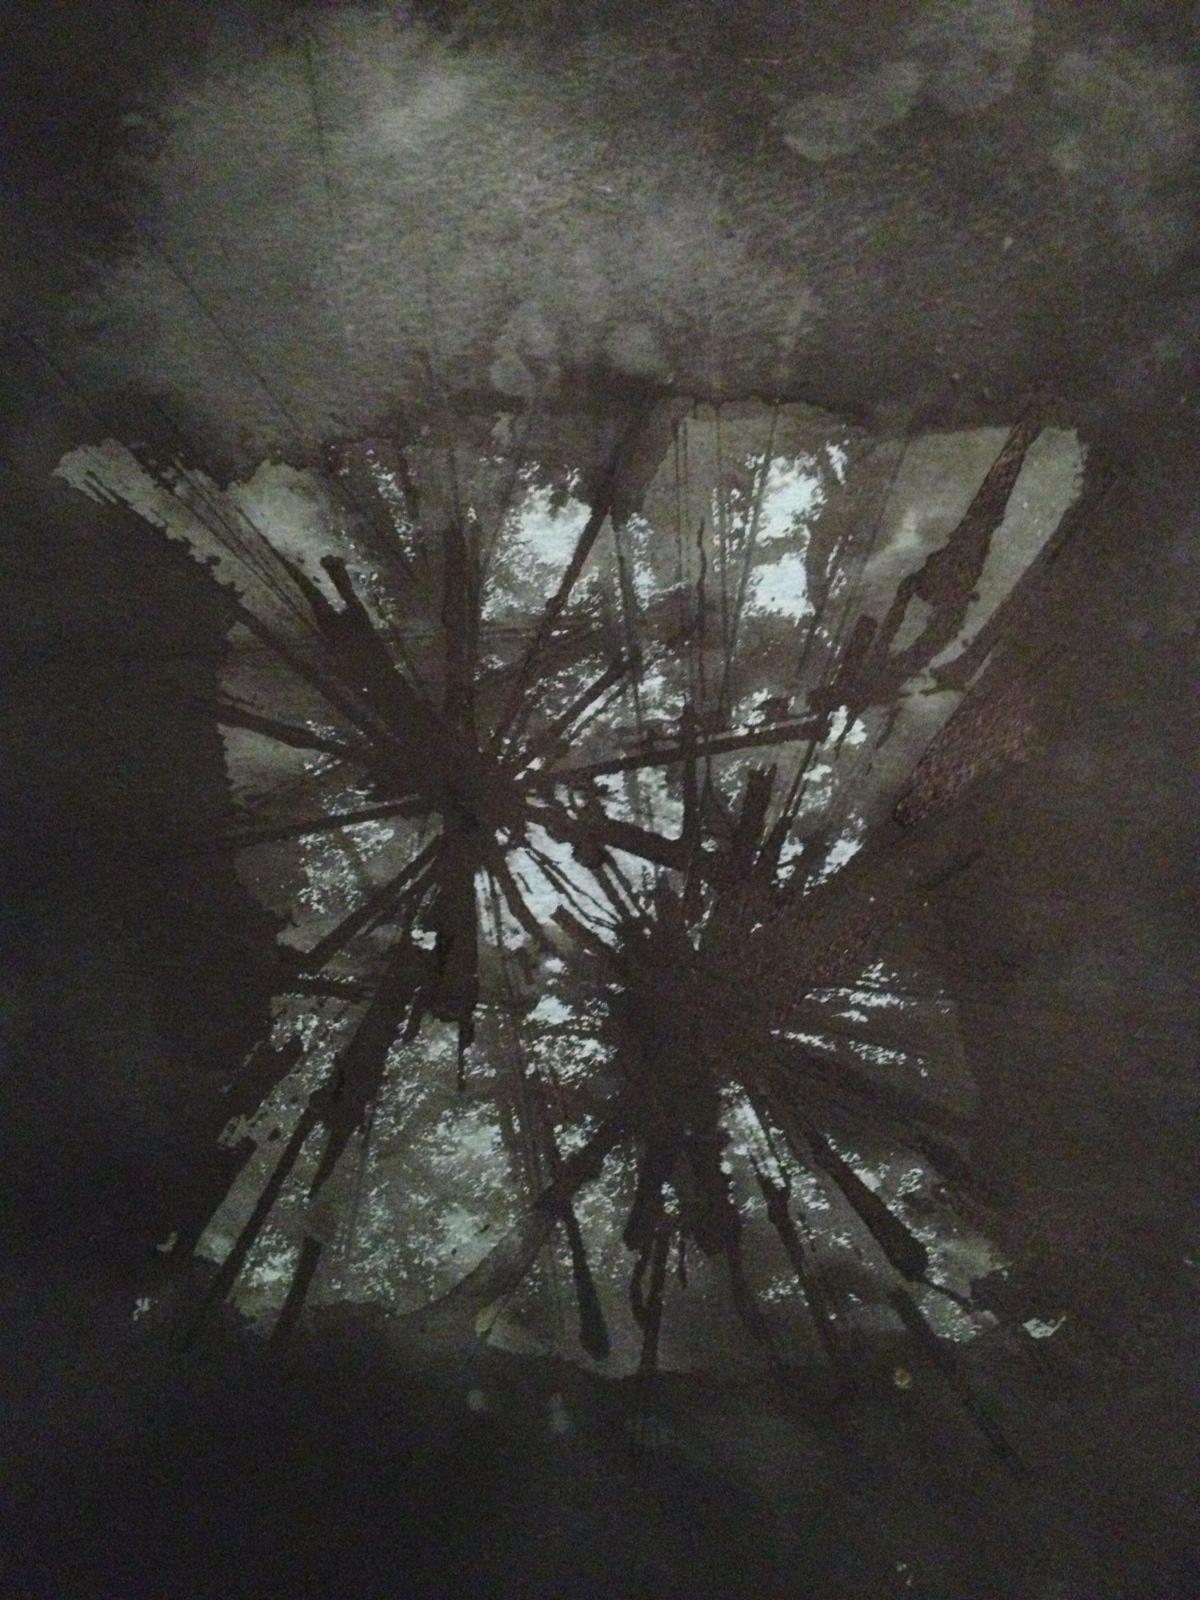 XX, sumi ink, 2014